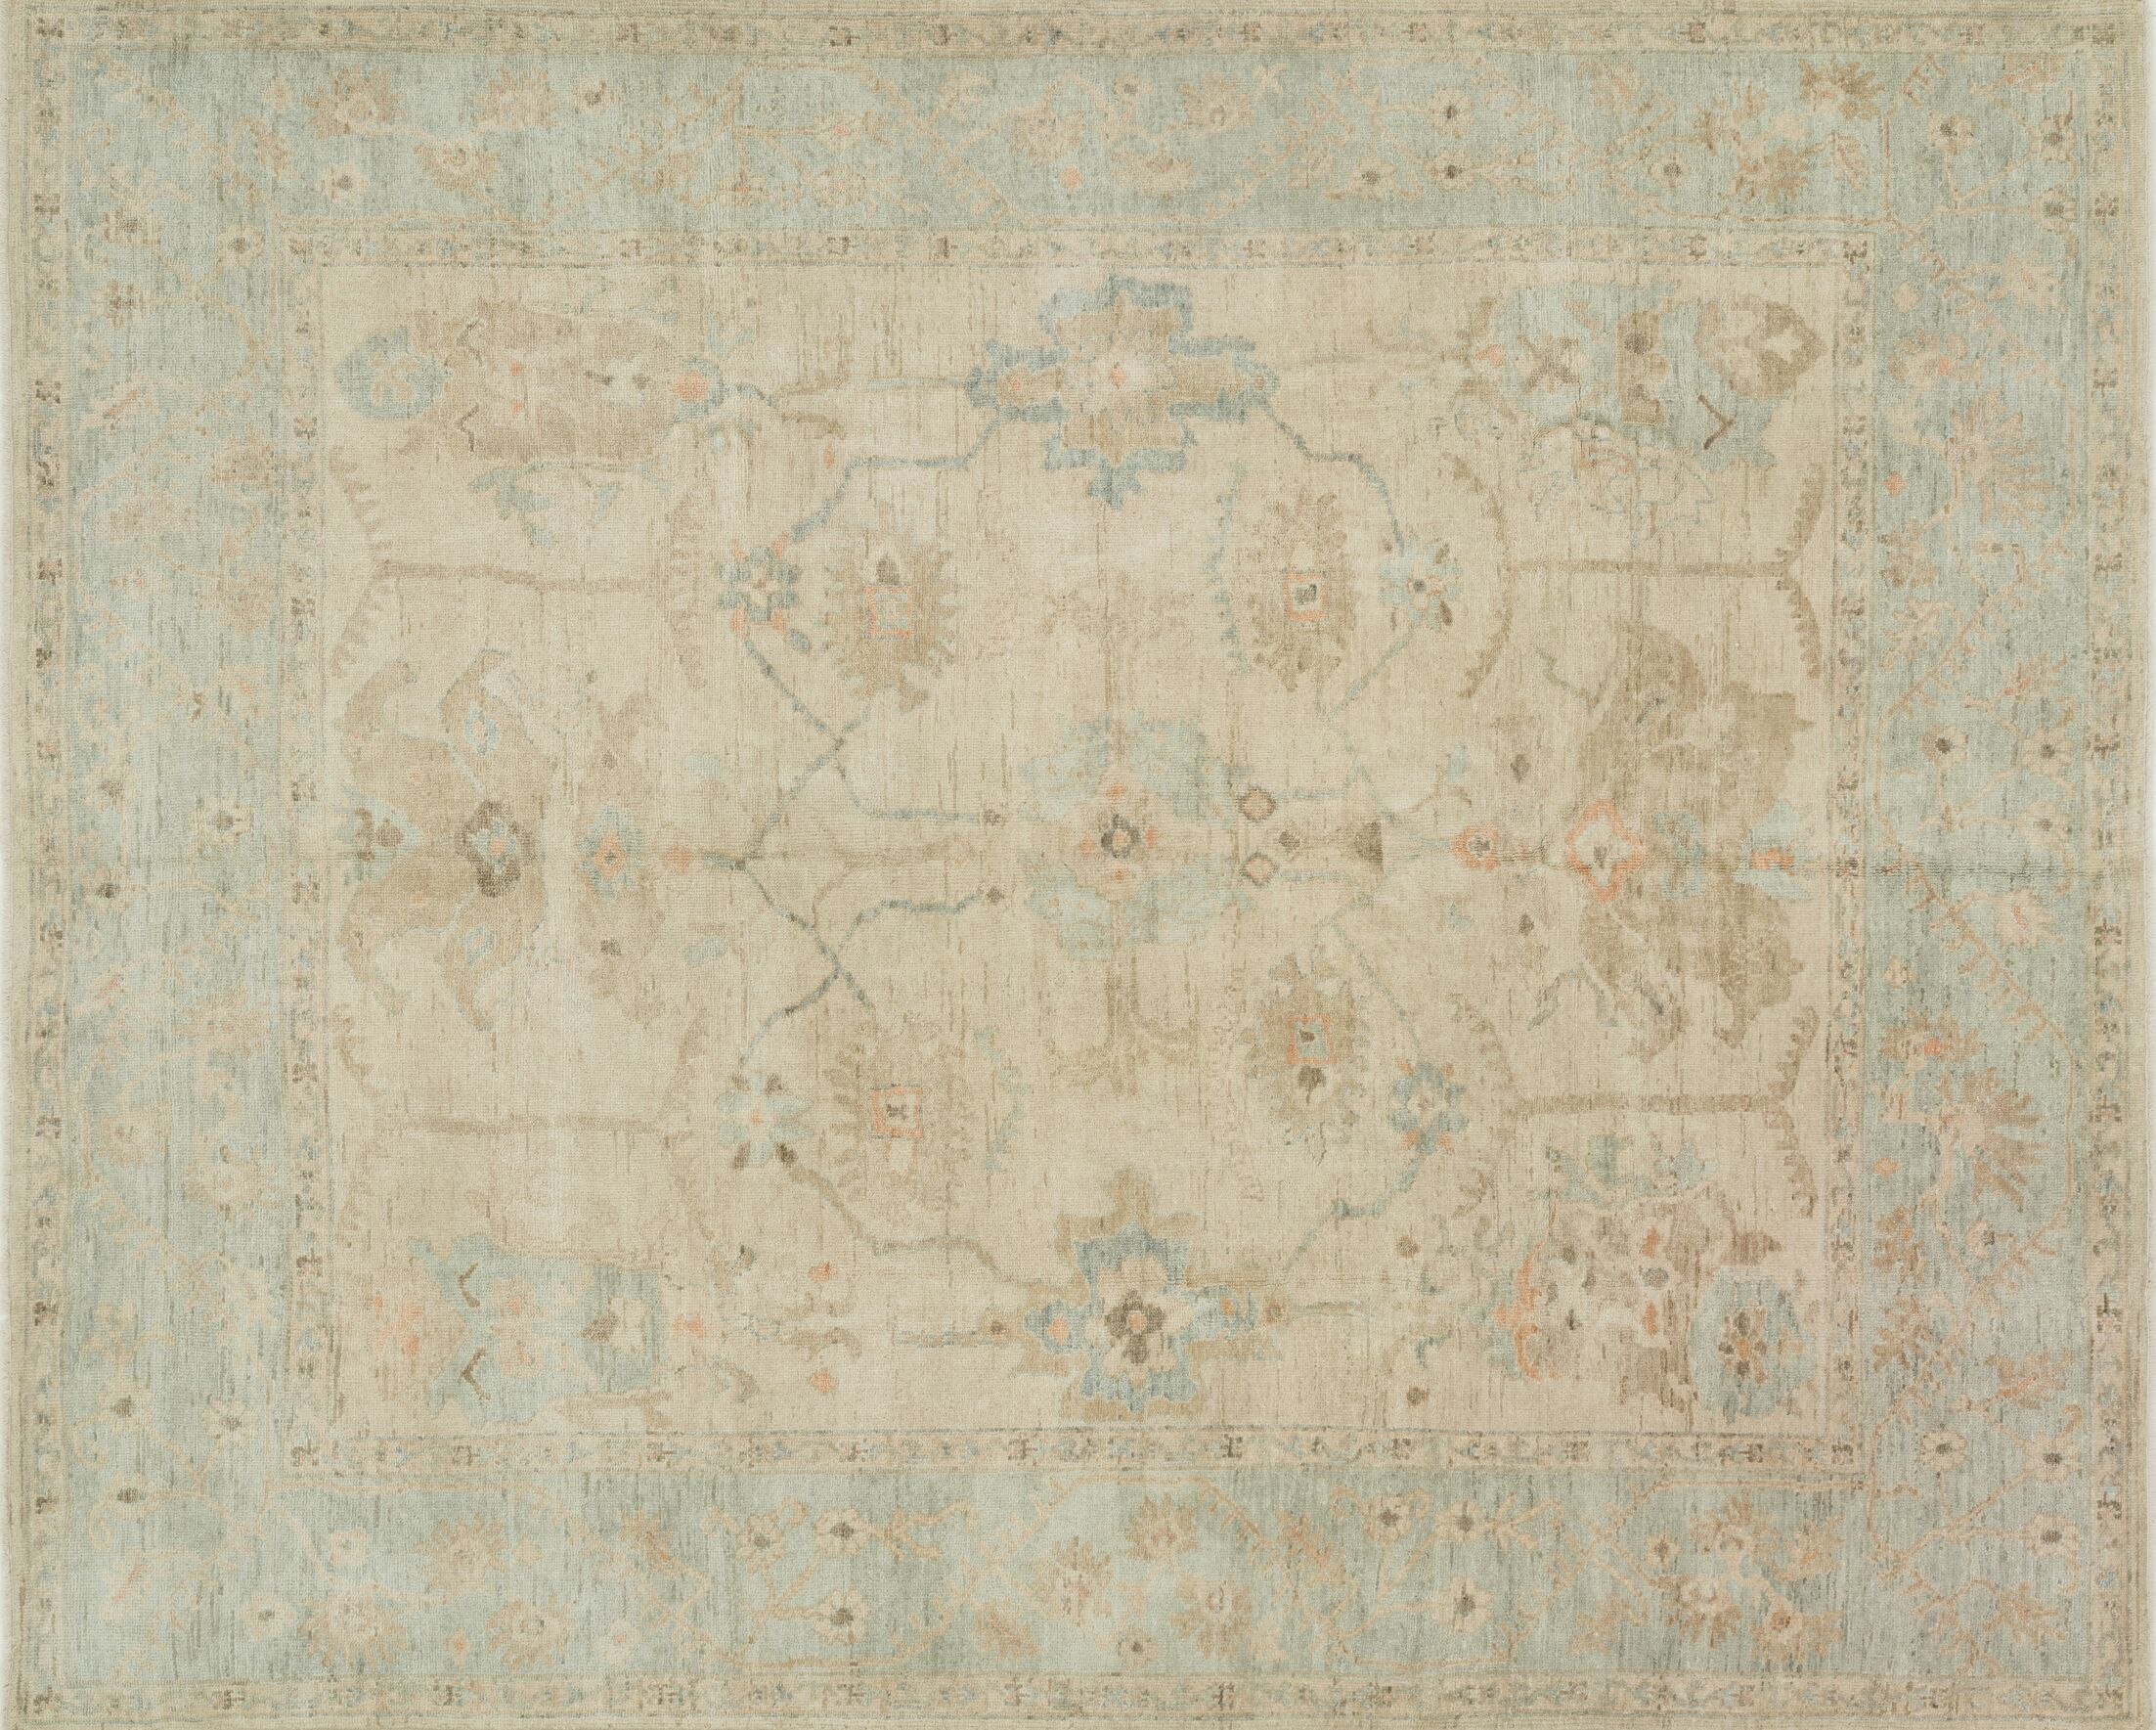 Abelard Hand-Knotted Stone/Mist Area Rug Rug Size: Rectangle 12' x 15'